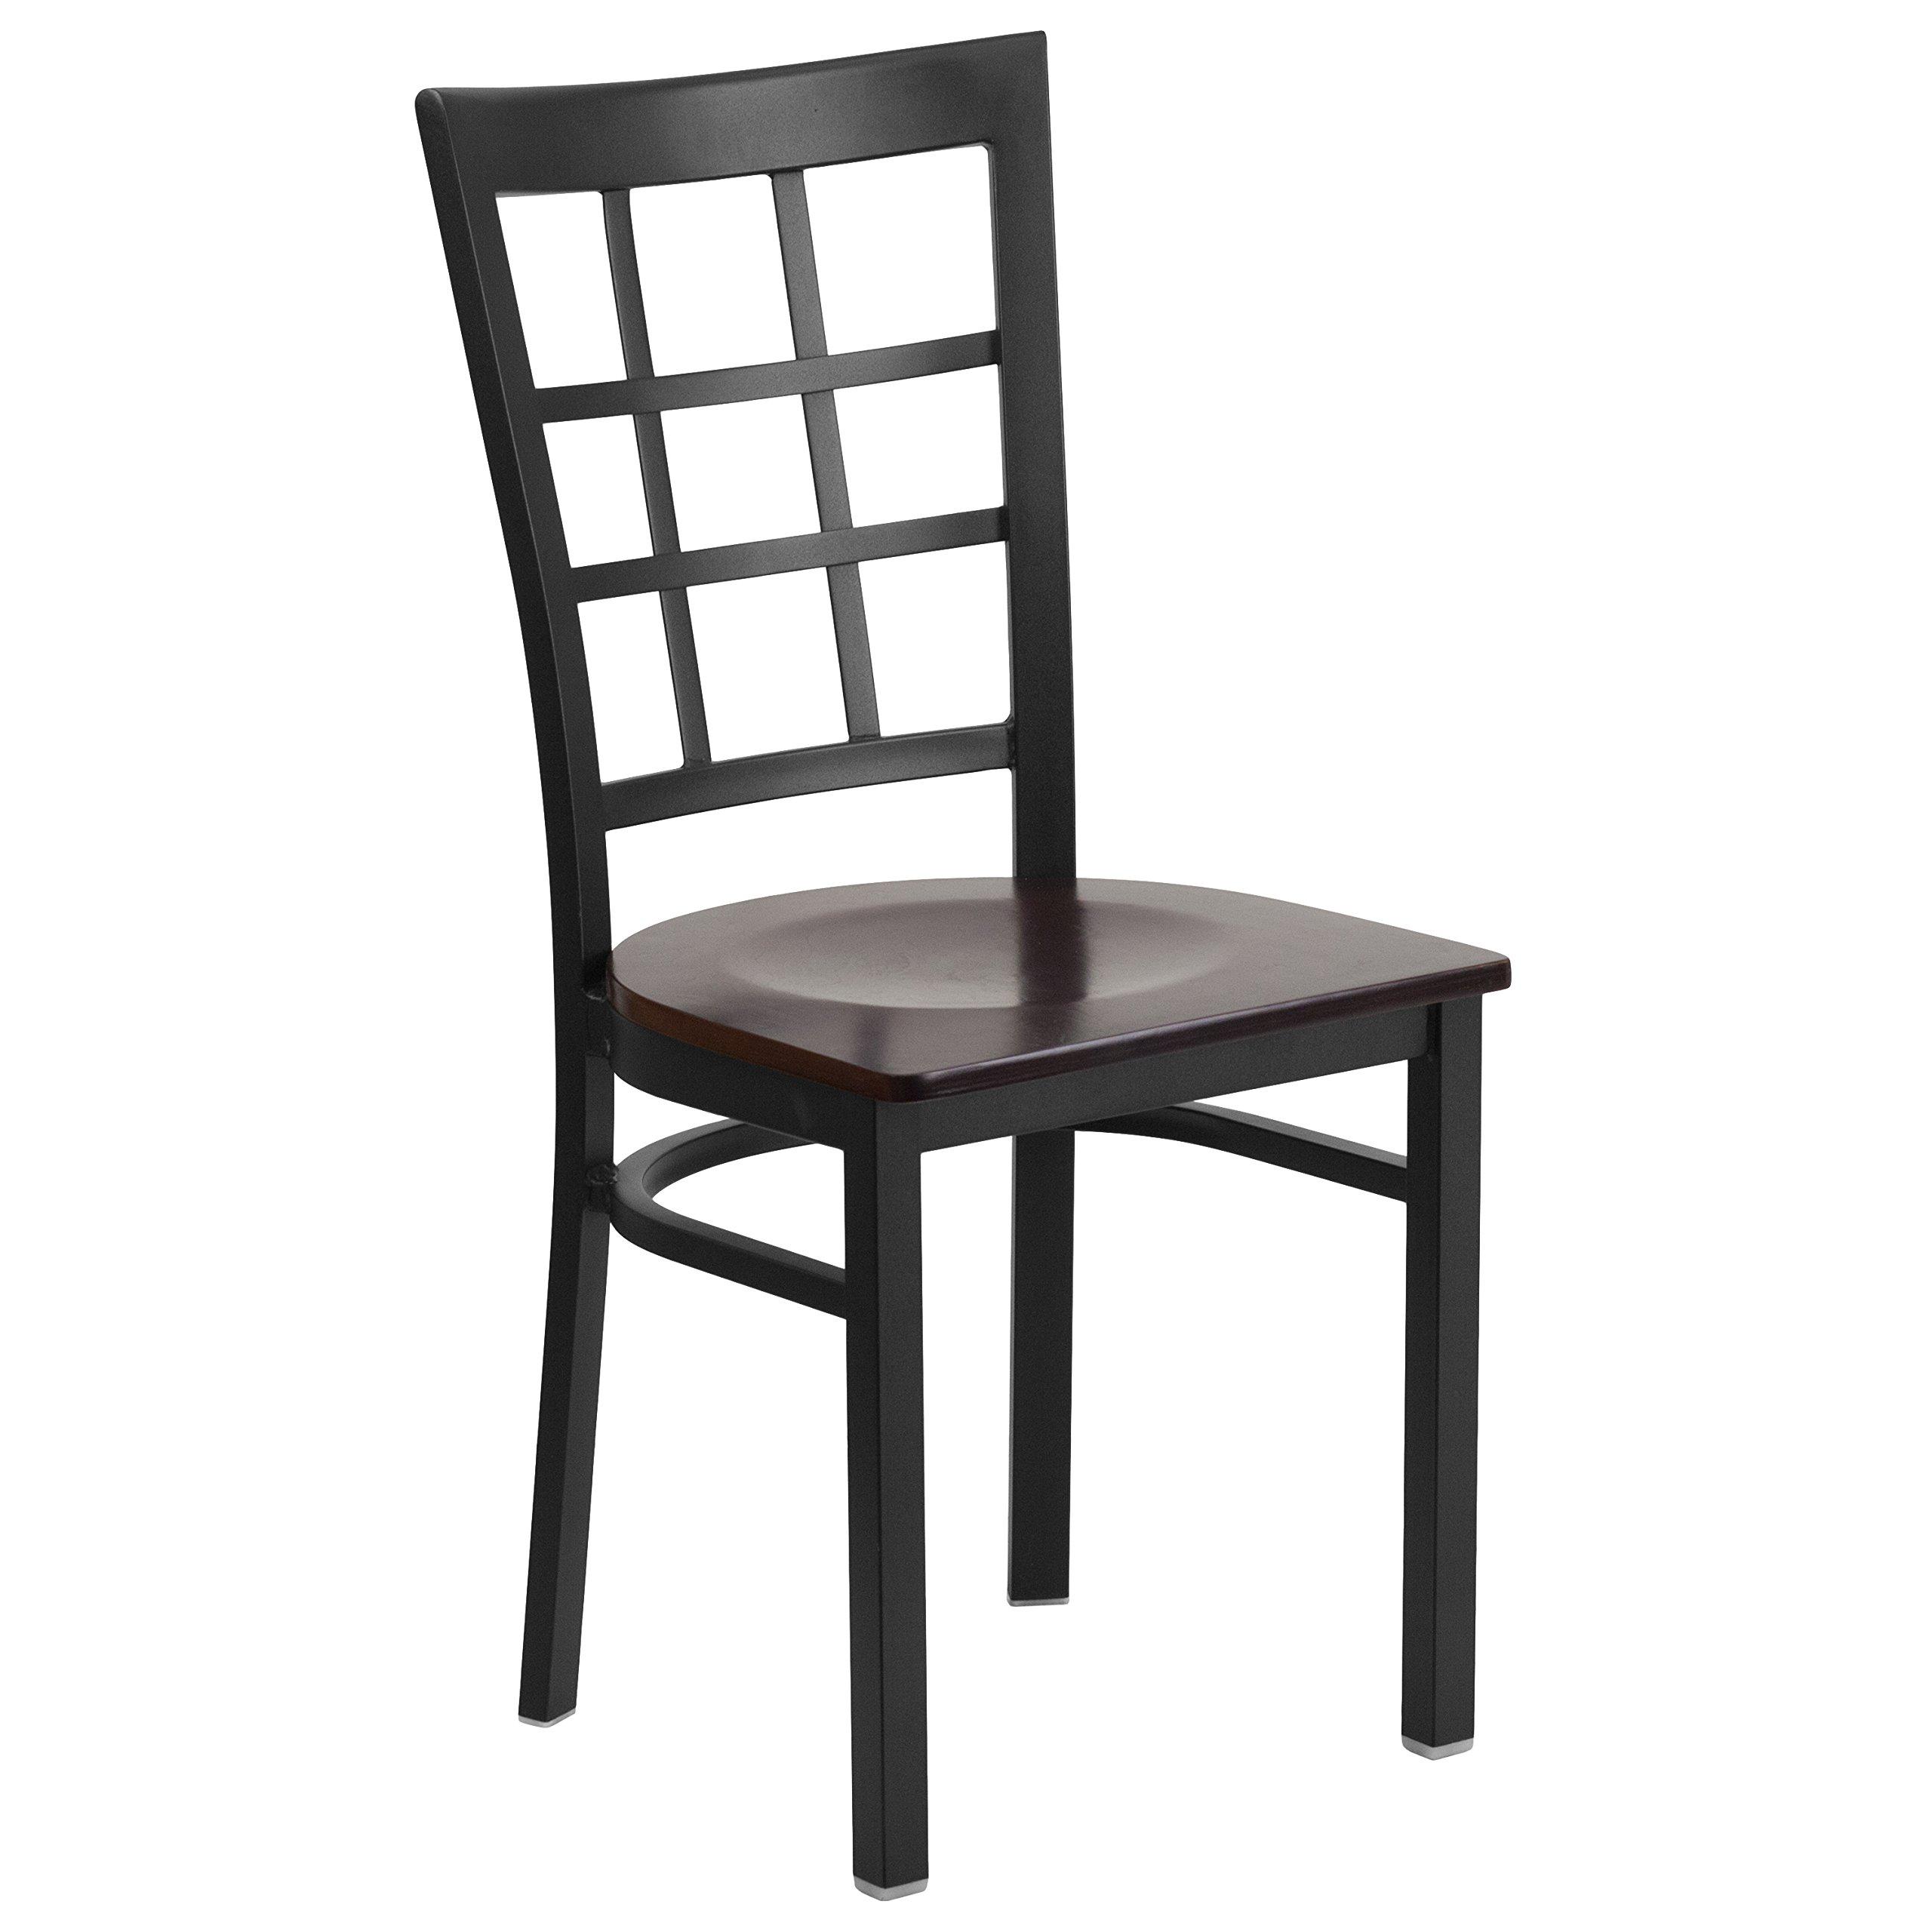 Flash Furniture HERCULES Series Black Window Back Metal Restaurant Chair - Walnut Wood Seat